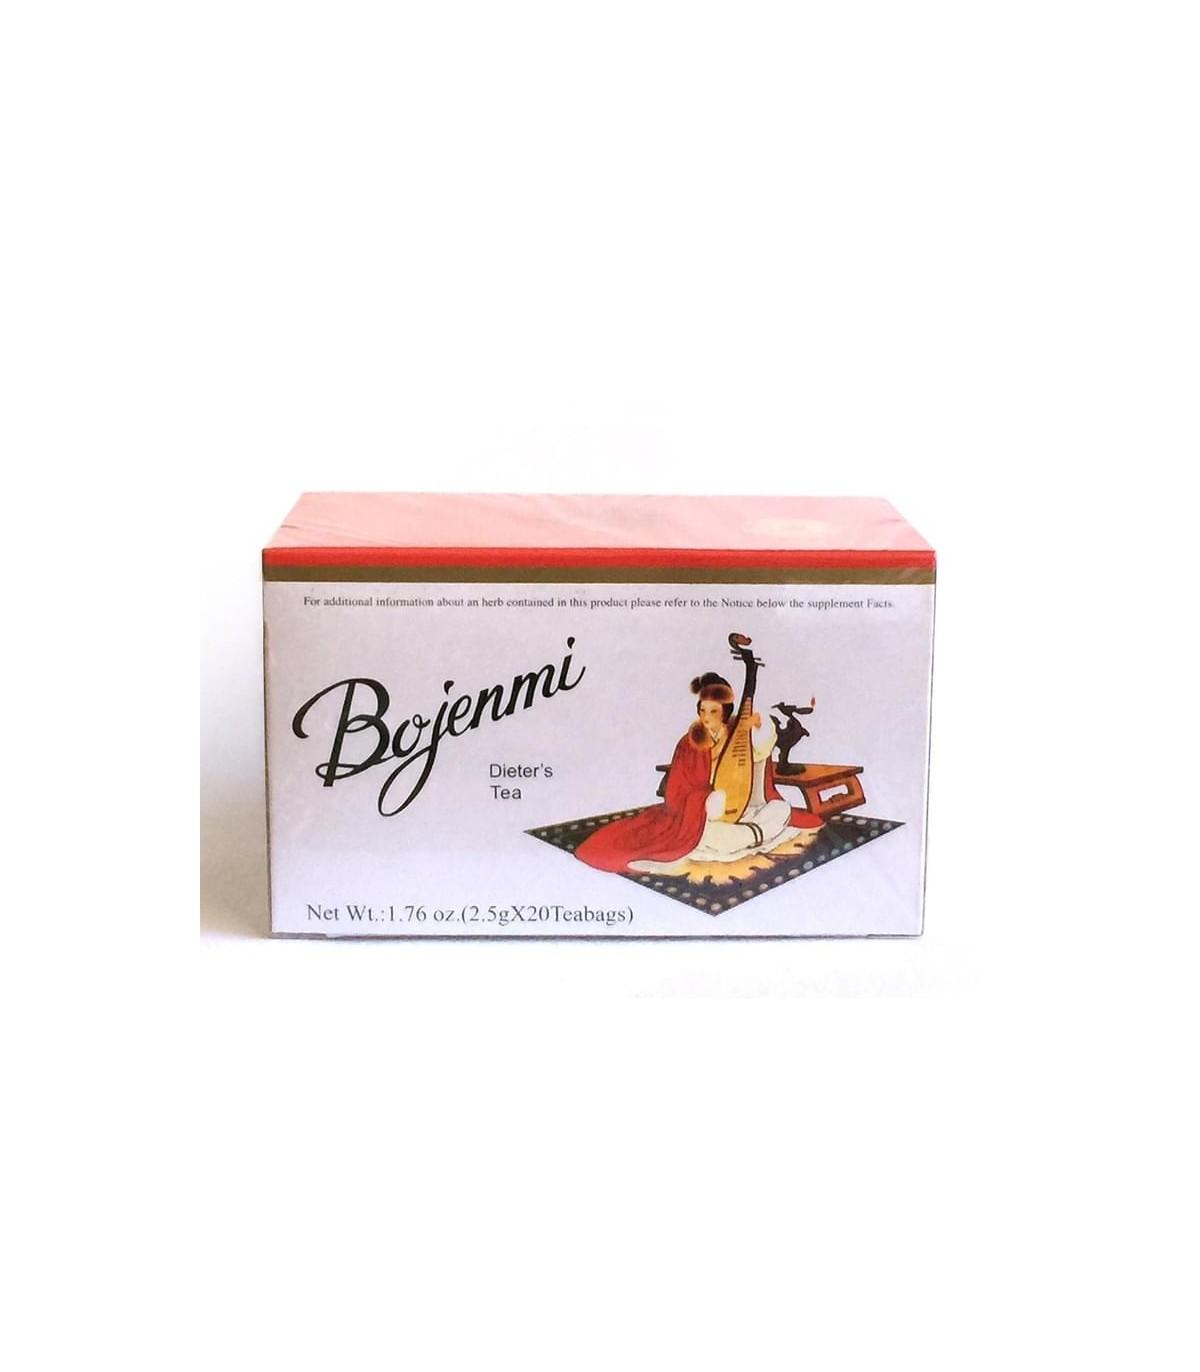 Bojenmi herbal tea - Bojenmi Herbal Tea 14